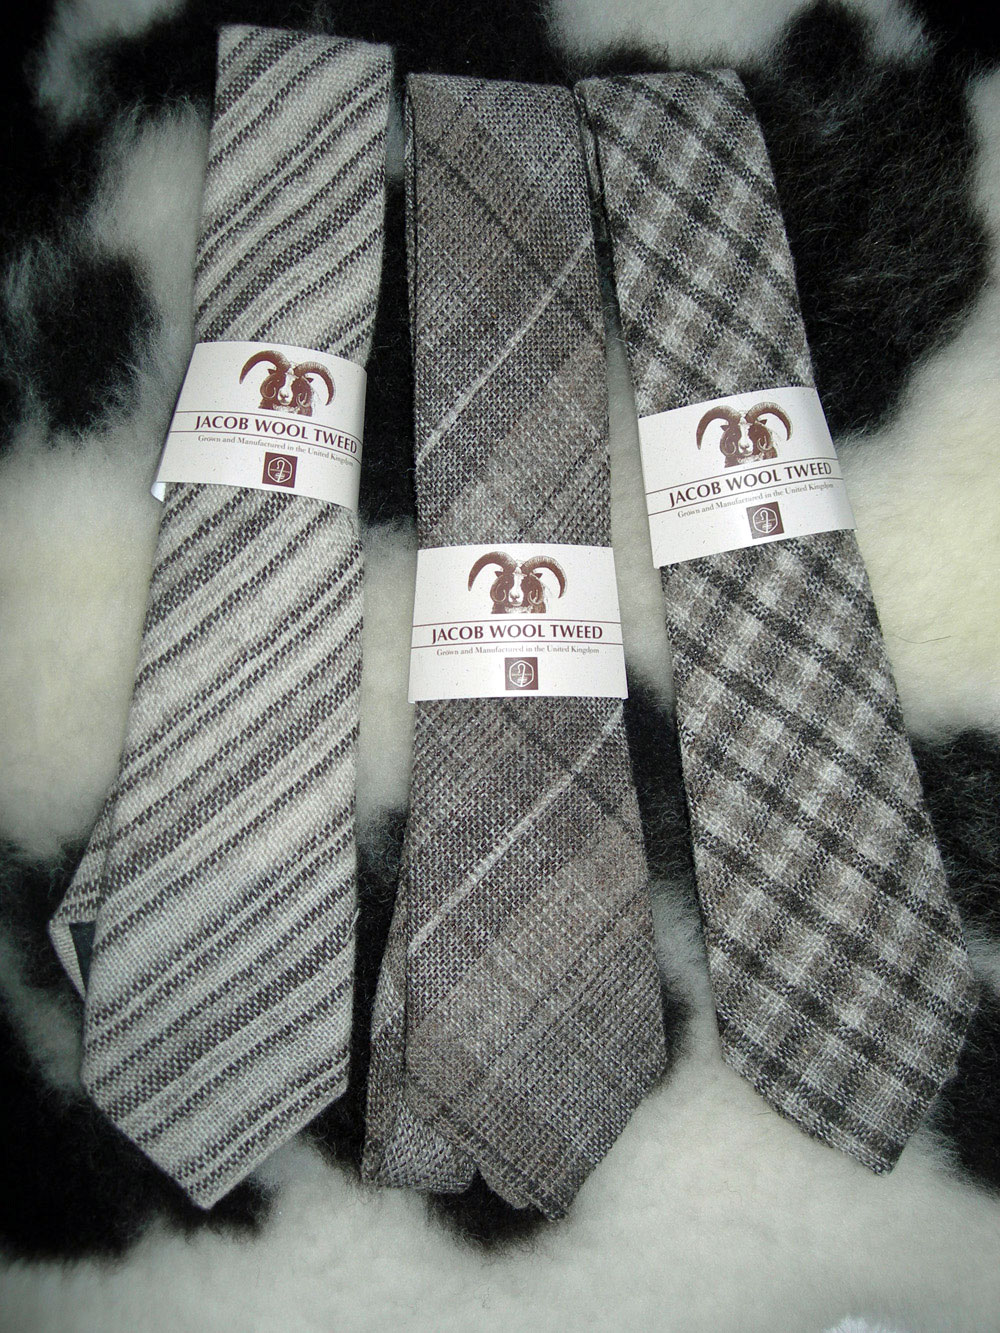 British Jacob sheep wool neck tie - Huxtable Farm